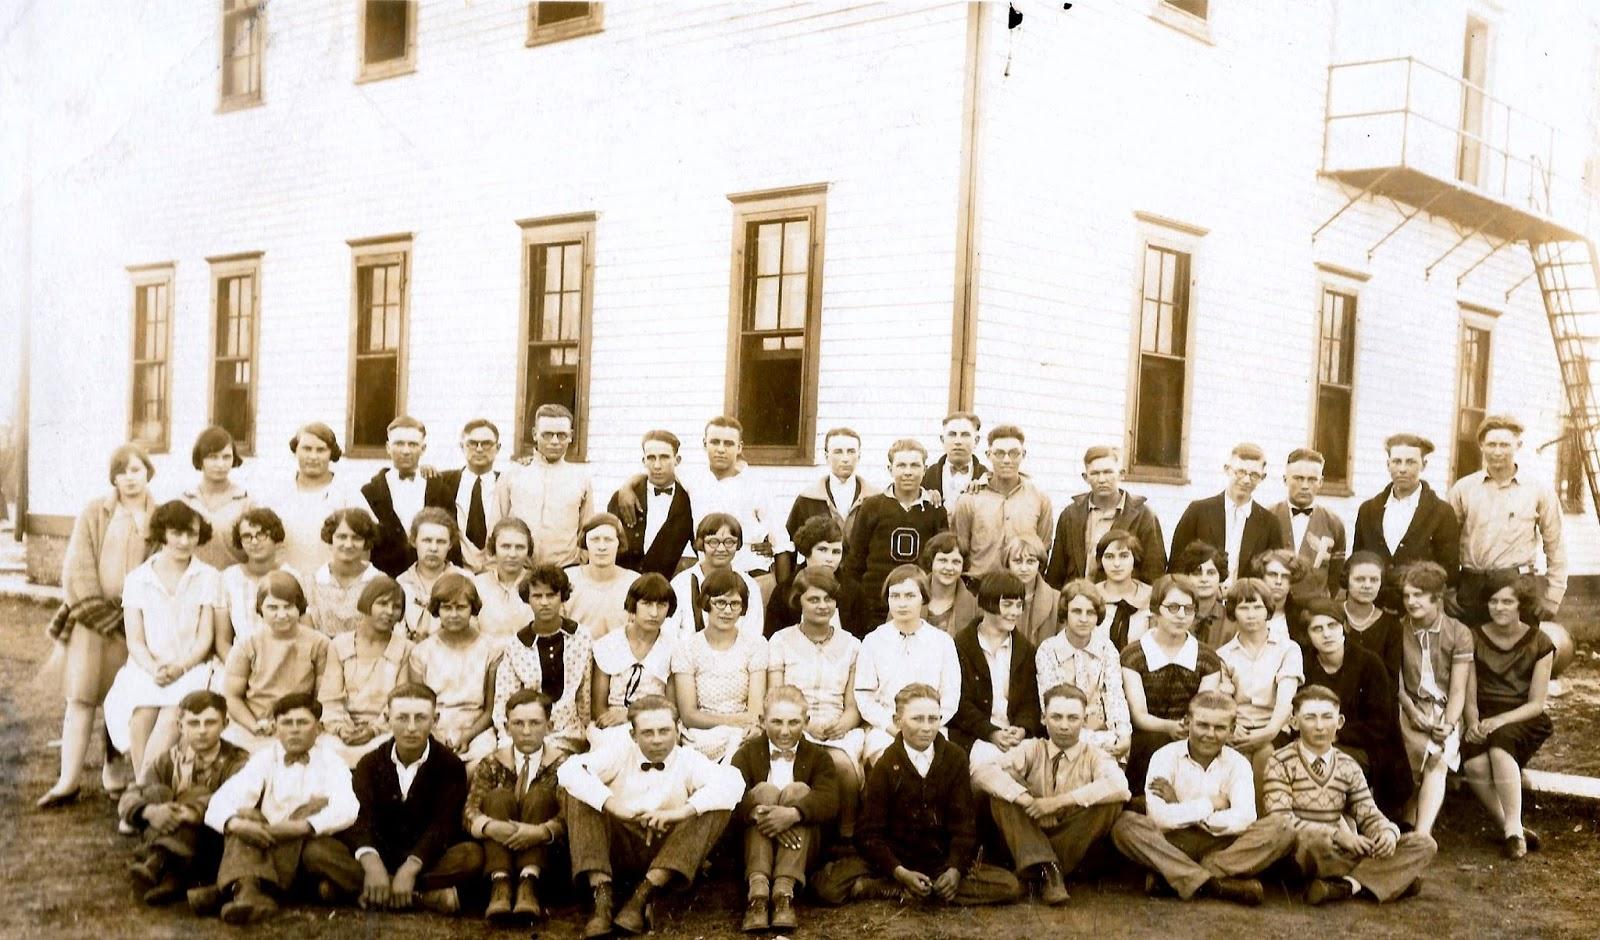 Sutton Nebraska Museum: Ong High School student body - spring 1928